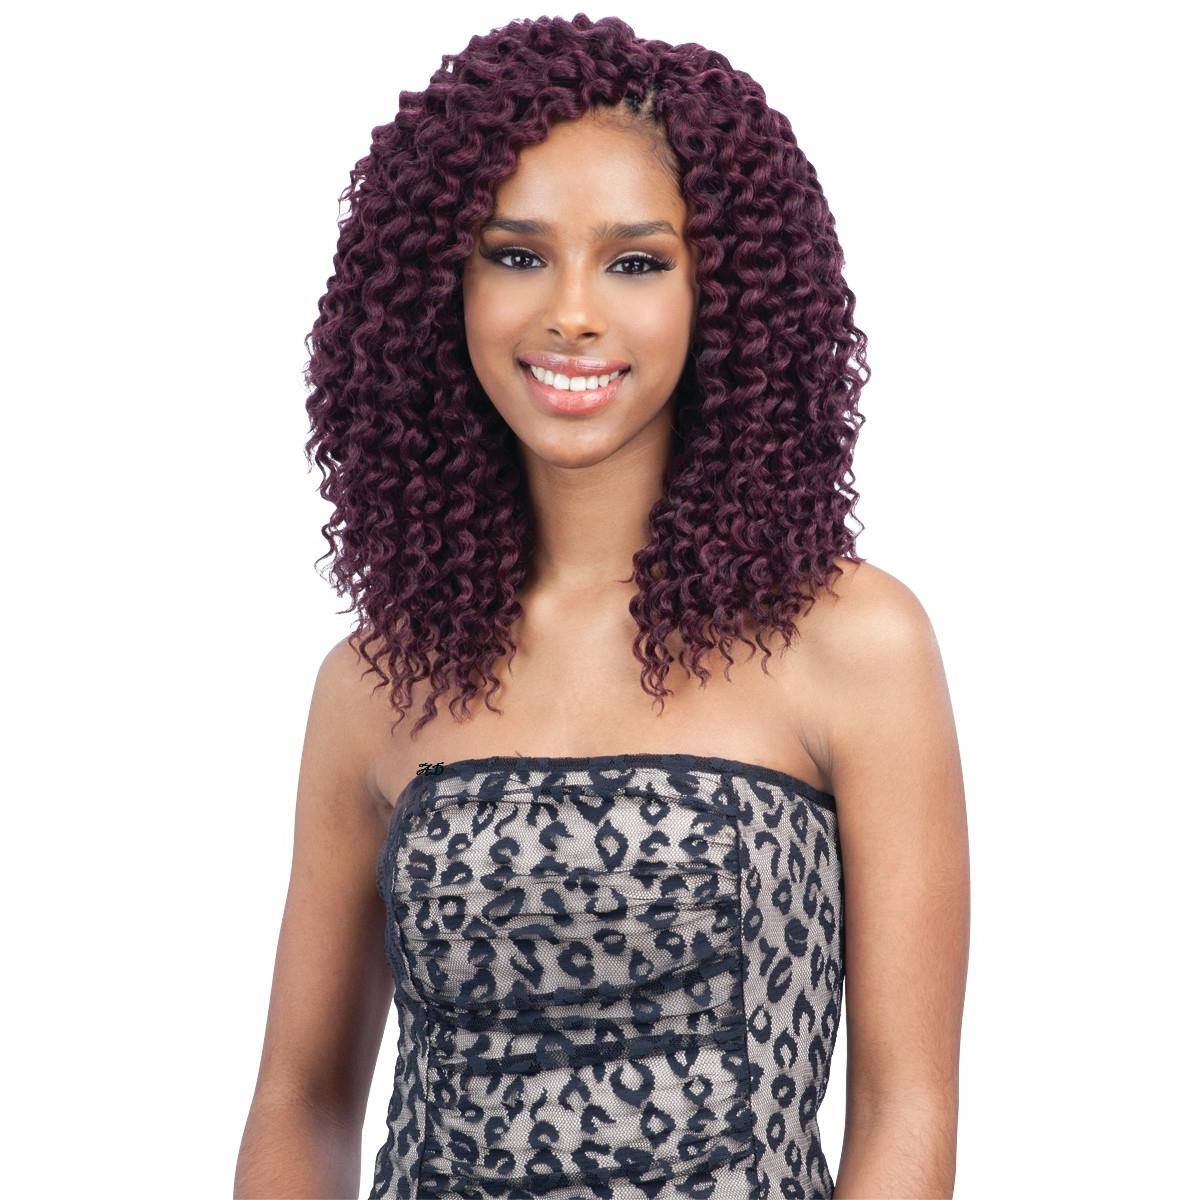 DEEP TWIST 10u0026quot; - FREETRESS SYNTHETIC HAIR CROCHET BRAID BULK | EBay